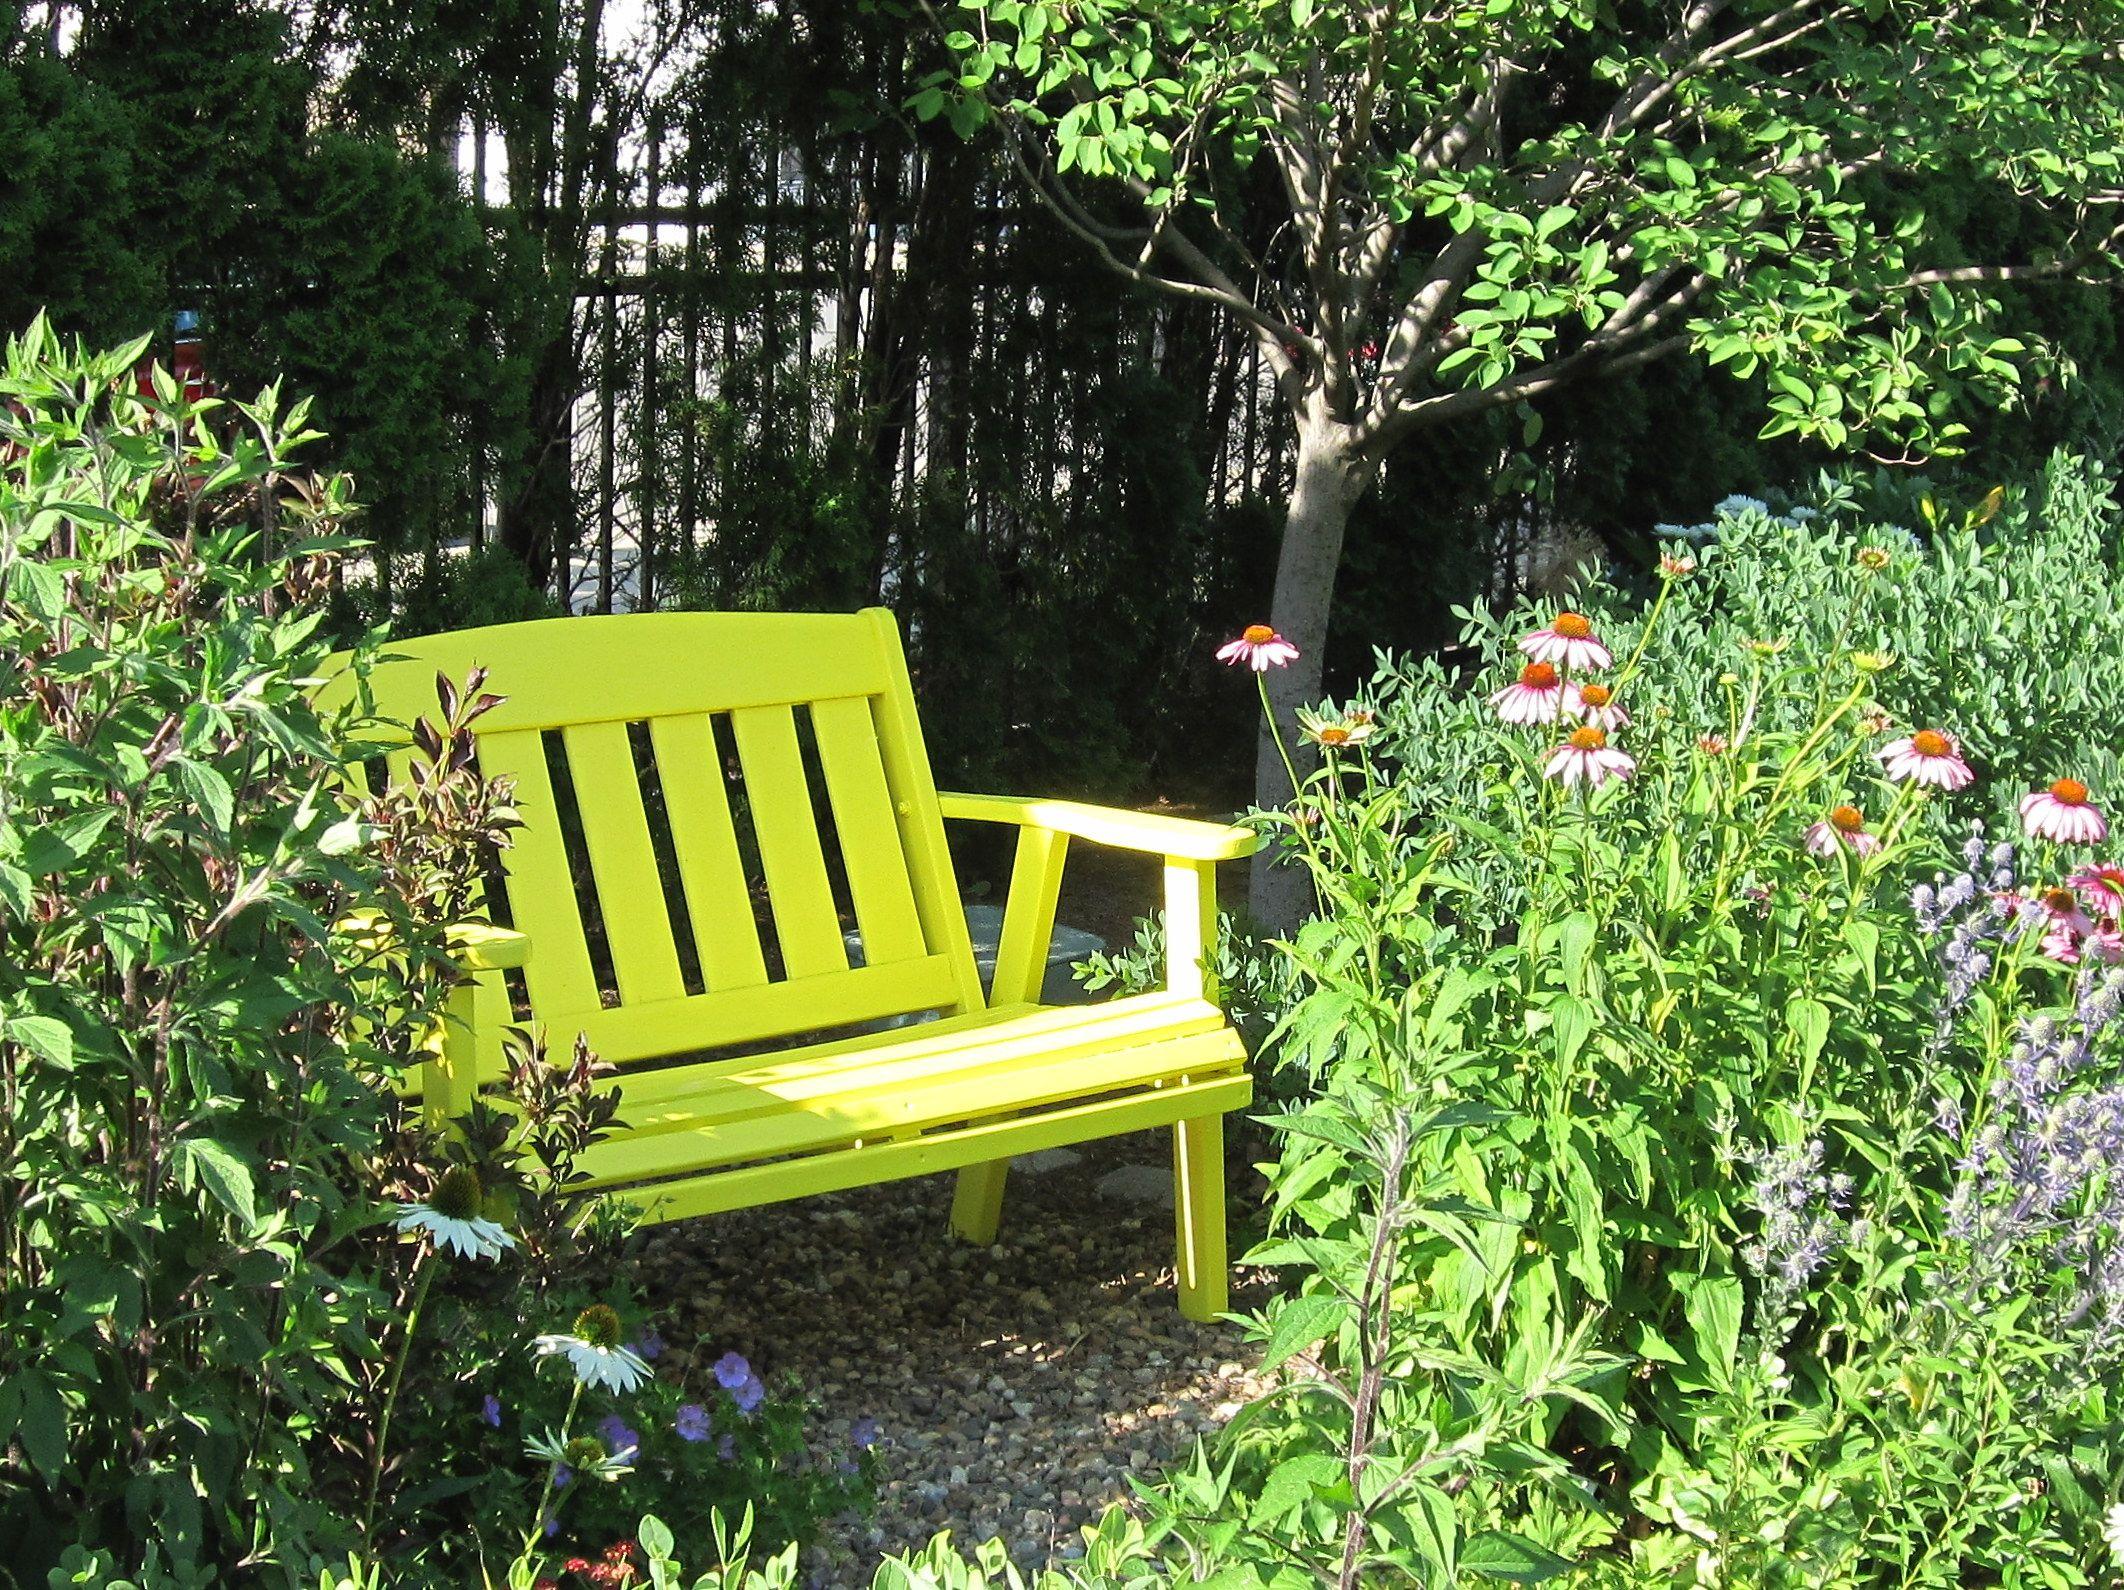 a1458663d498a8c5f3f5ac2fab319432 - Better Homes And Gardens Test Garden Des Moines Iowa